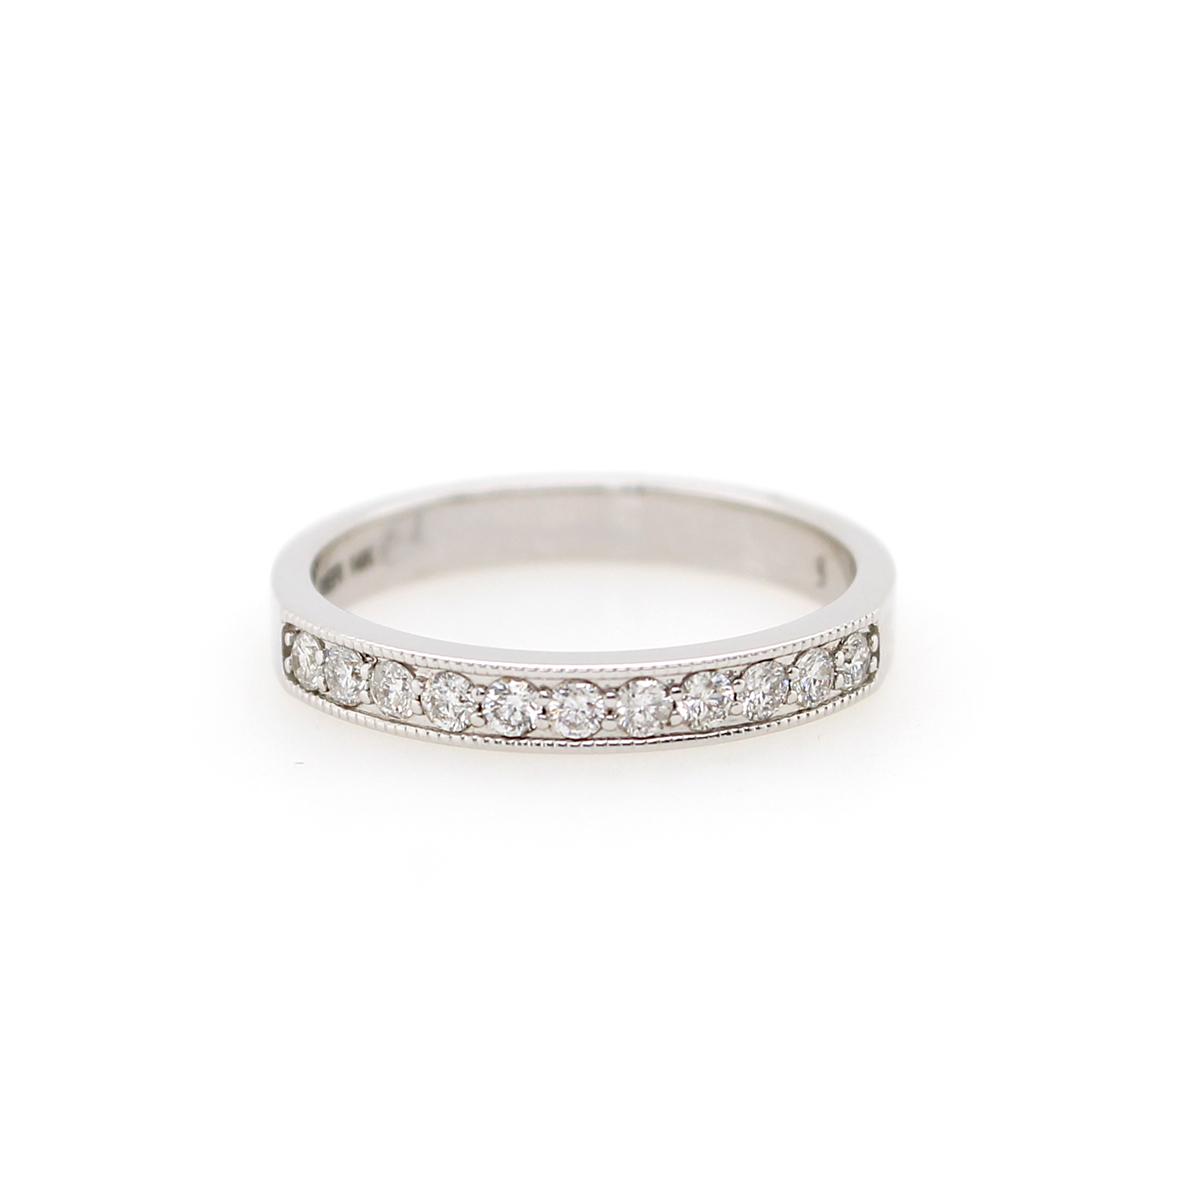 Shefi Diamonds 14 Karat White Gold .33 Carat Millgrain Edge Wedding Band